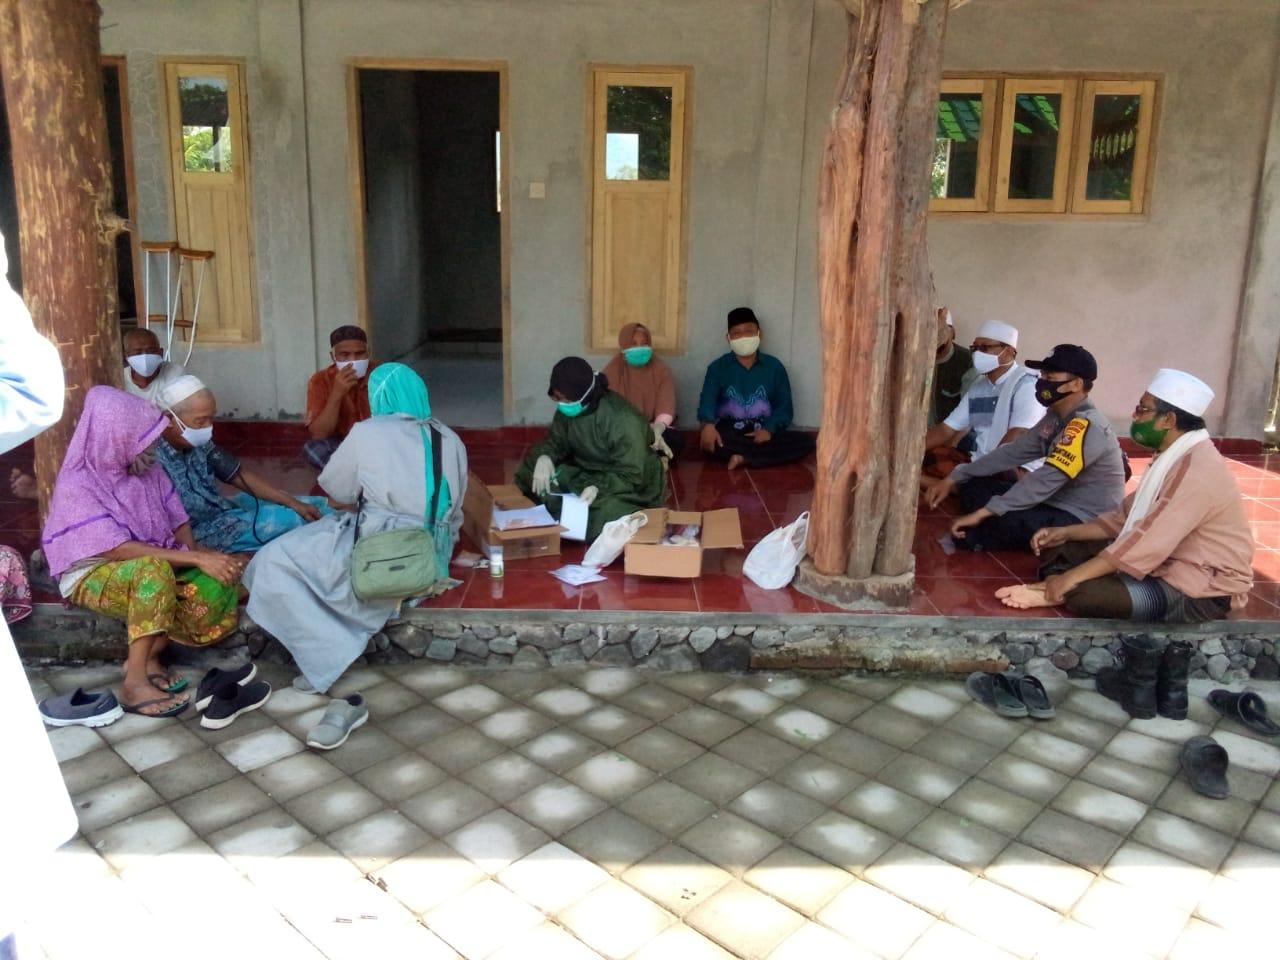 Kendalikan Sebaran Covid-19 di Desanya, Tim Kampung Sehat Desa Giri Sasak Kuripan Perkuat Pengawasan